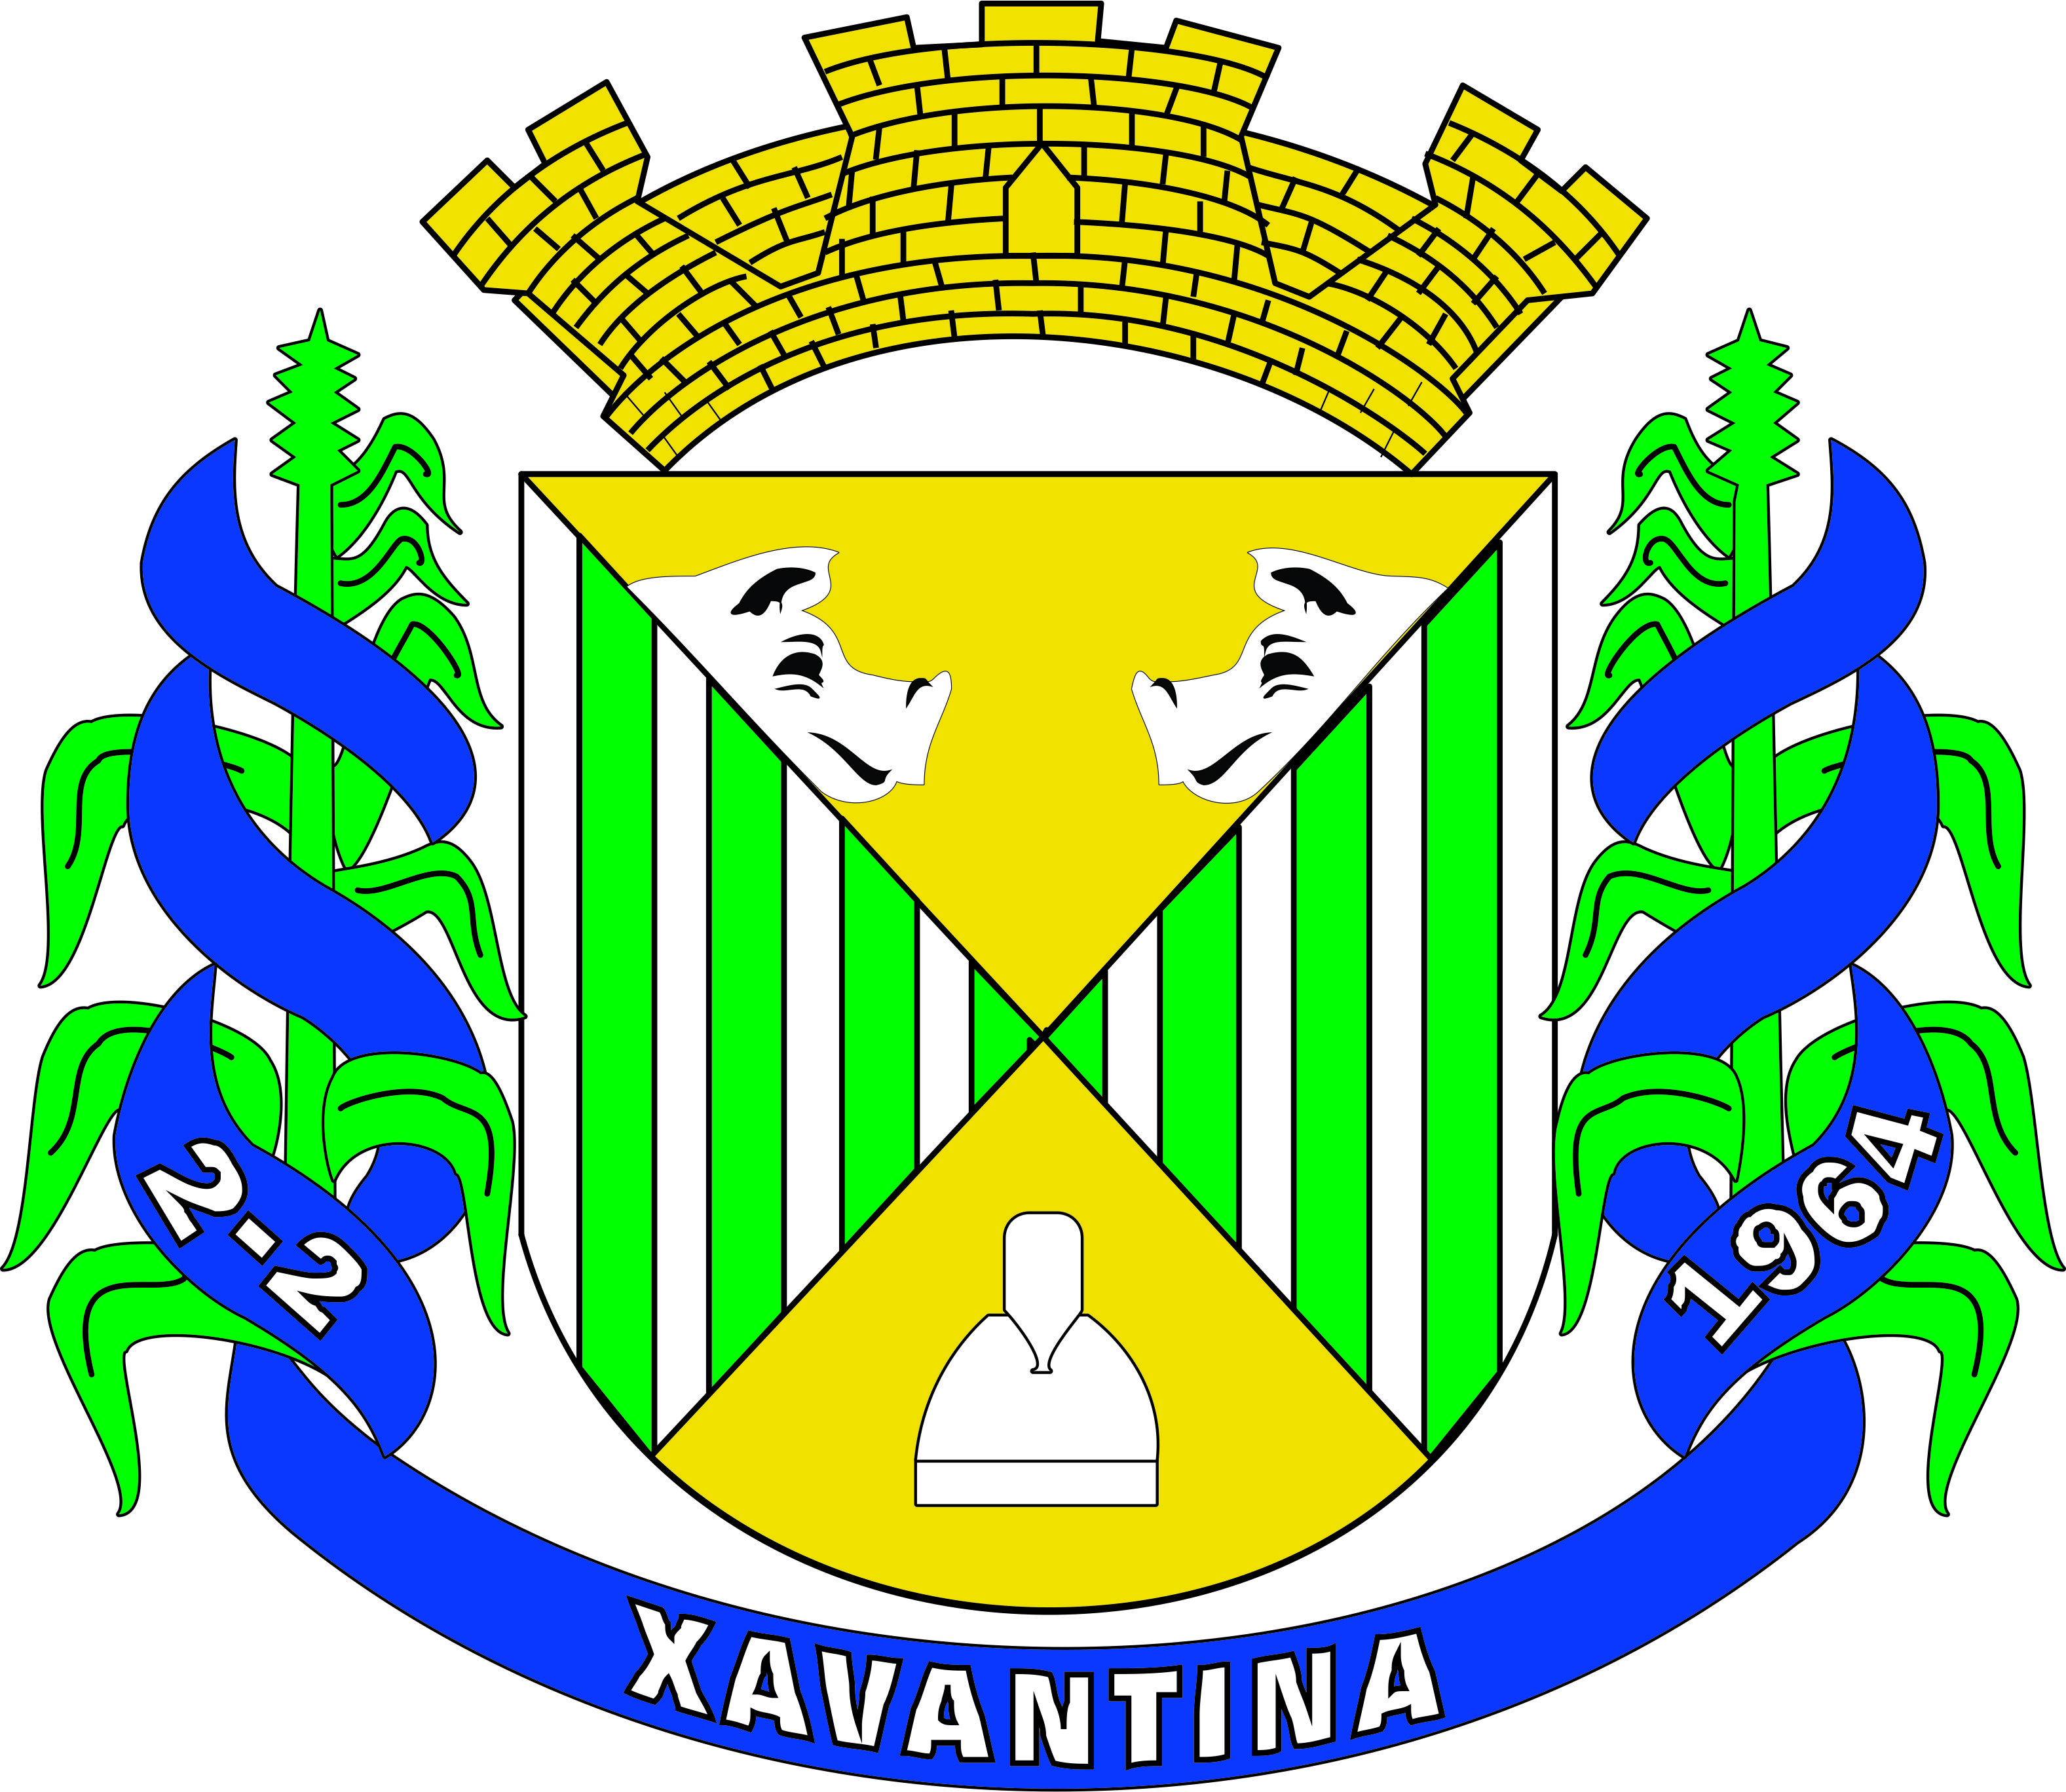 Prefeitura Municipal de Xavantina